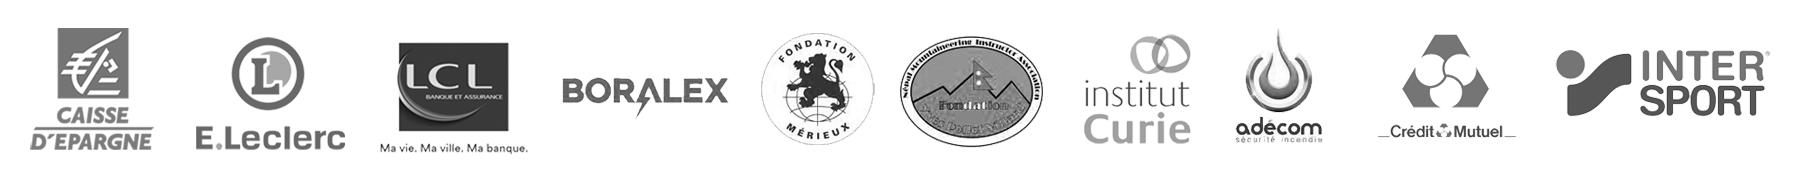 https://adret-conseil.com/wp-content/uploads/2021/02/logos_PARTENAIRES_ADRET.png